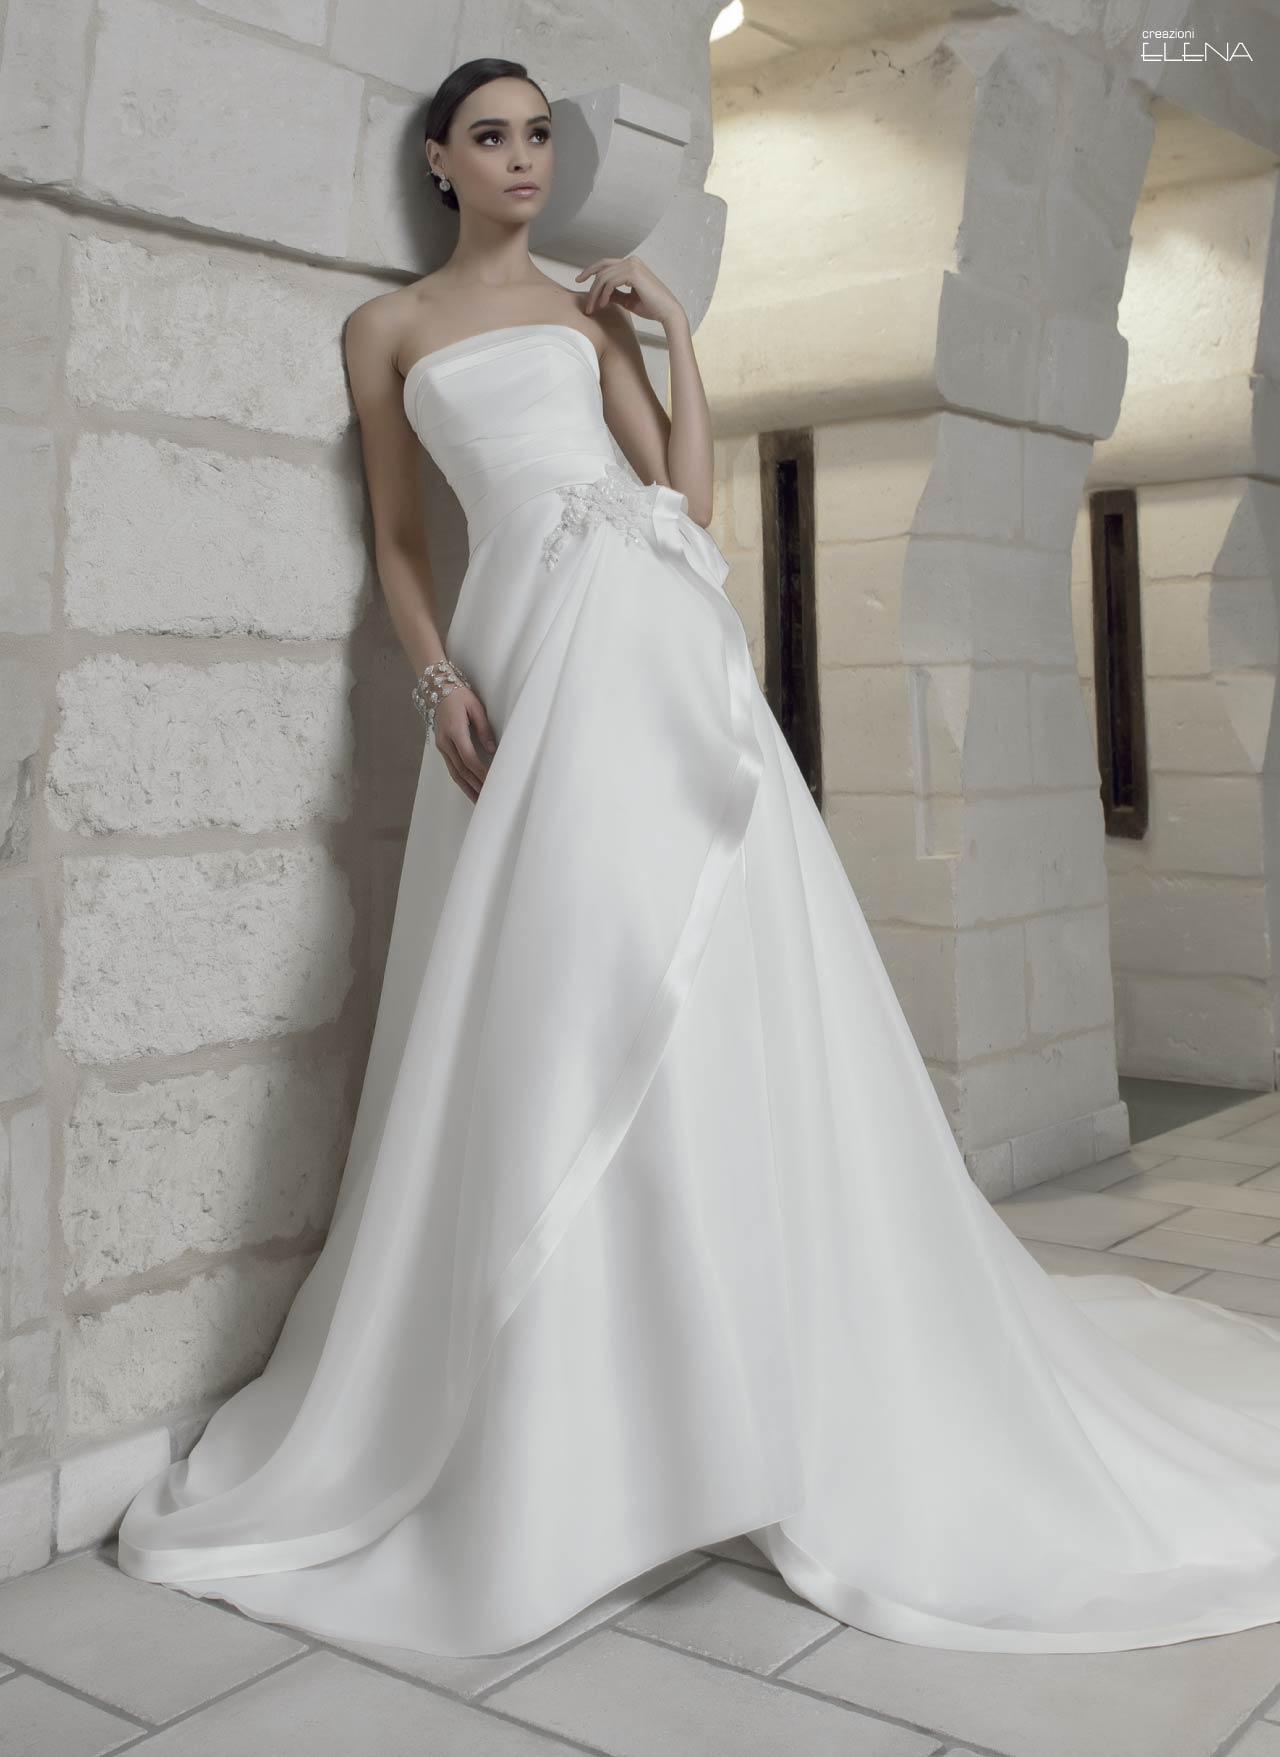 Abiti Da Sposa Jacqueline.Abiti Da Sposa 2018 Jacqueline Da Boutique Velo